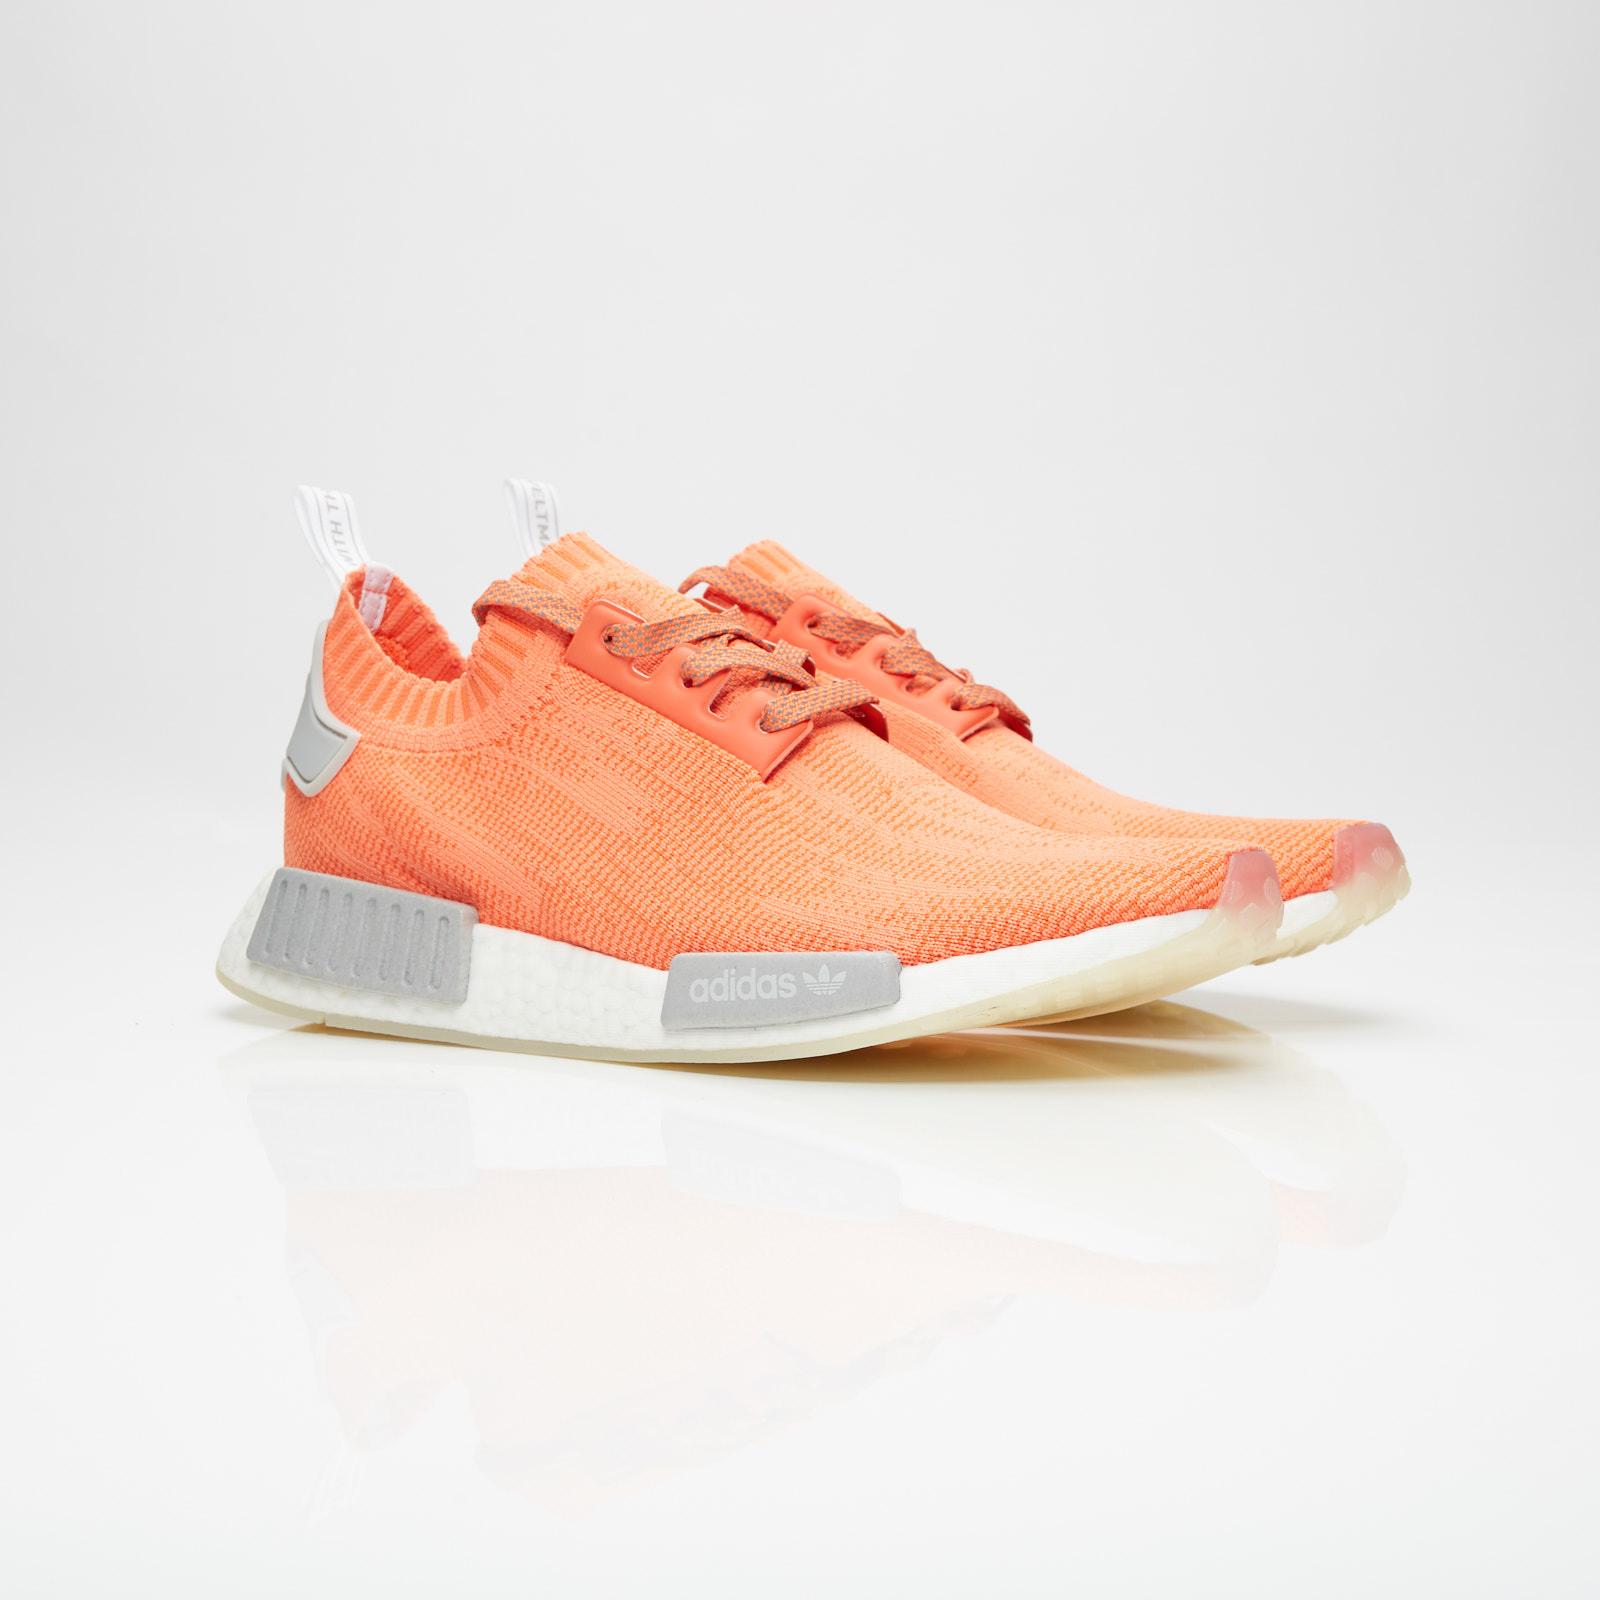 adidas nmd r1 pk b43522 sneakersnstuff scarpe & streetwear